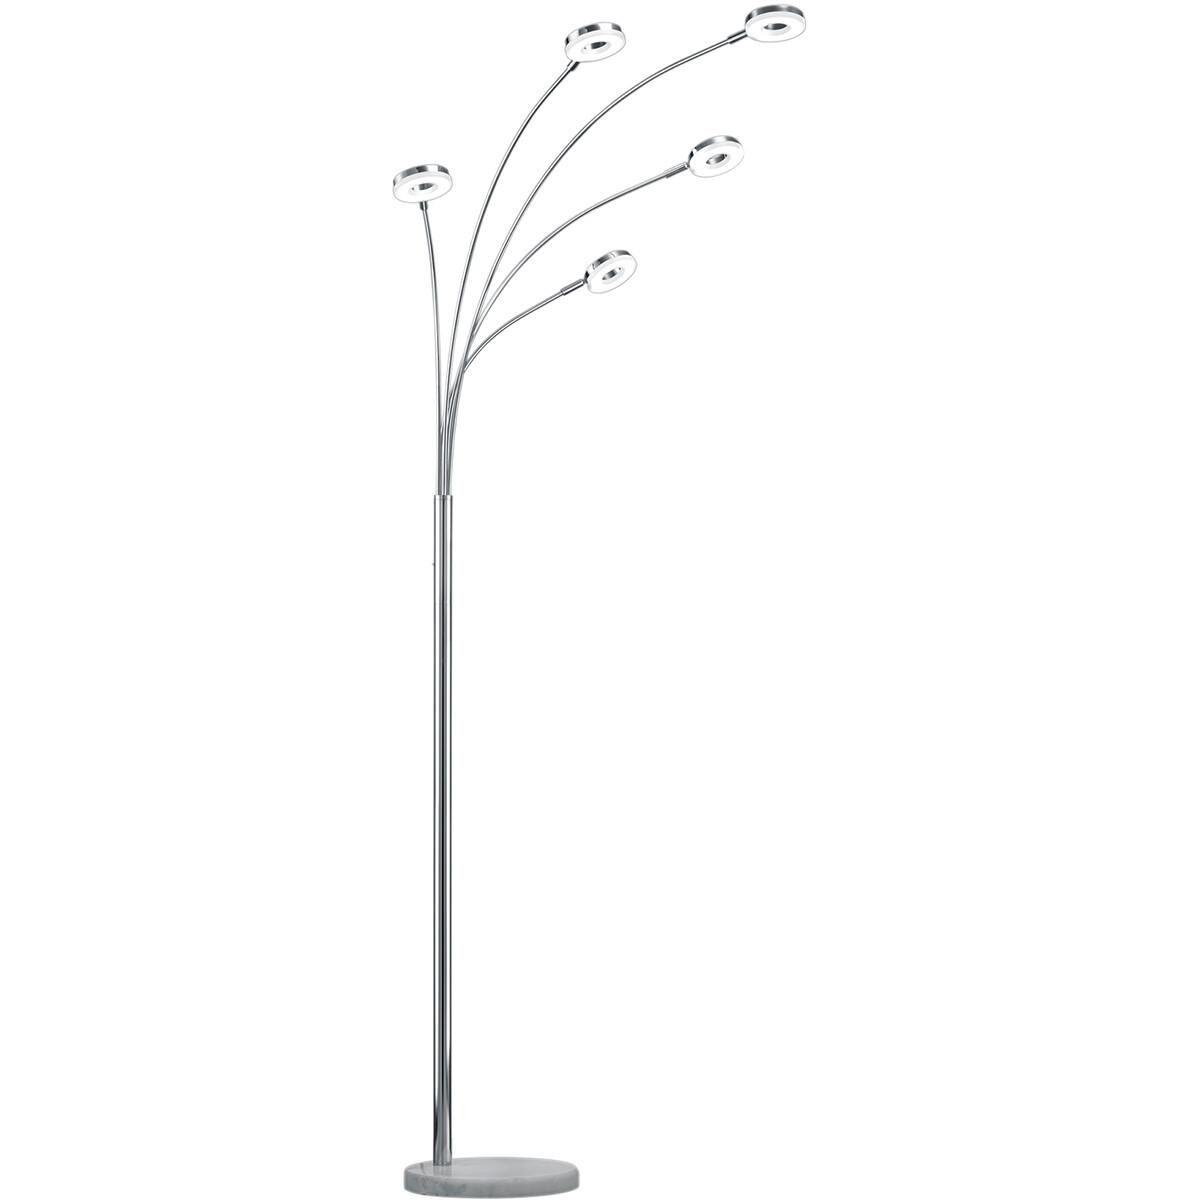 LED Vloerlamp - Trion Renny - 20W - Warm Wit 3000K - Rond - Mat Chroom - Aluminium